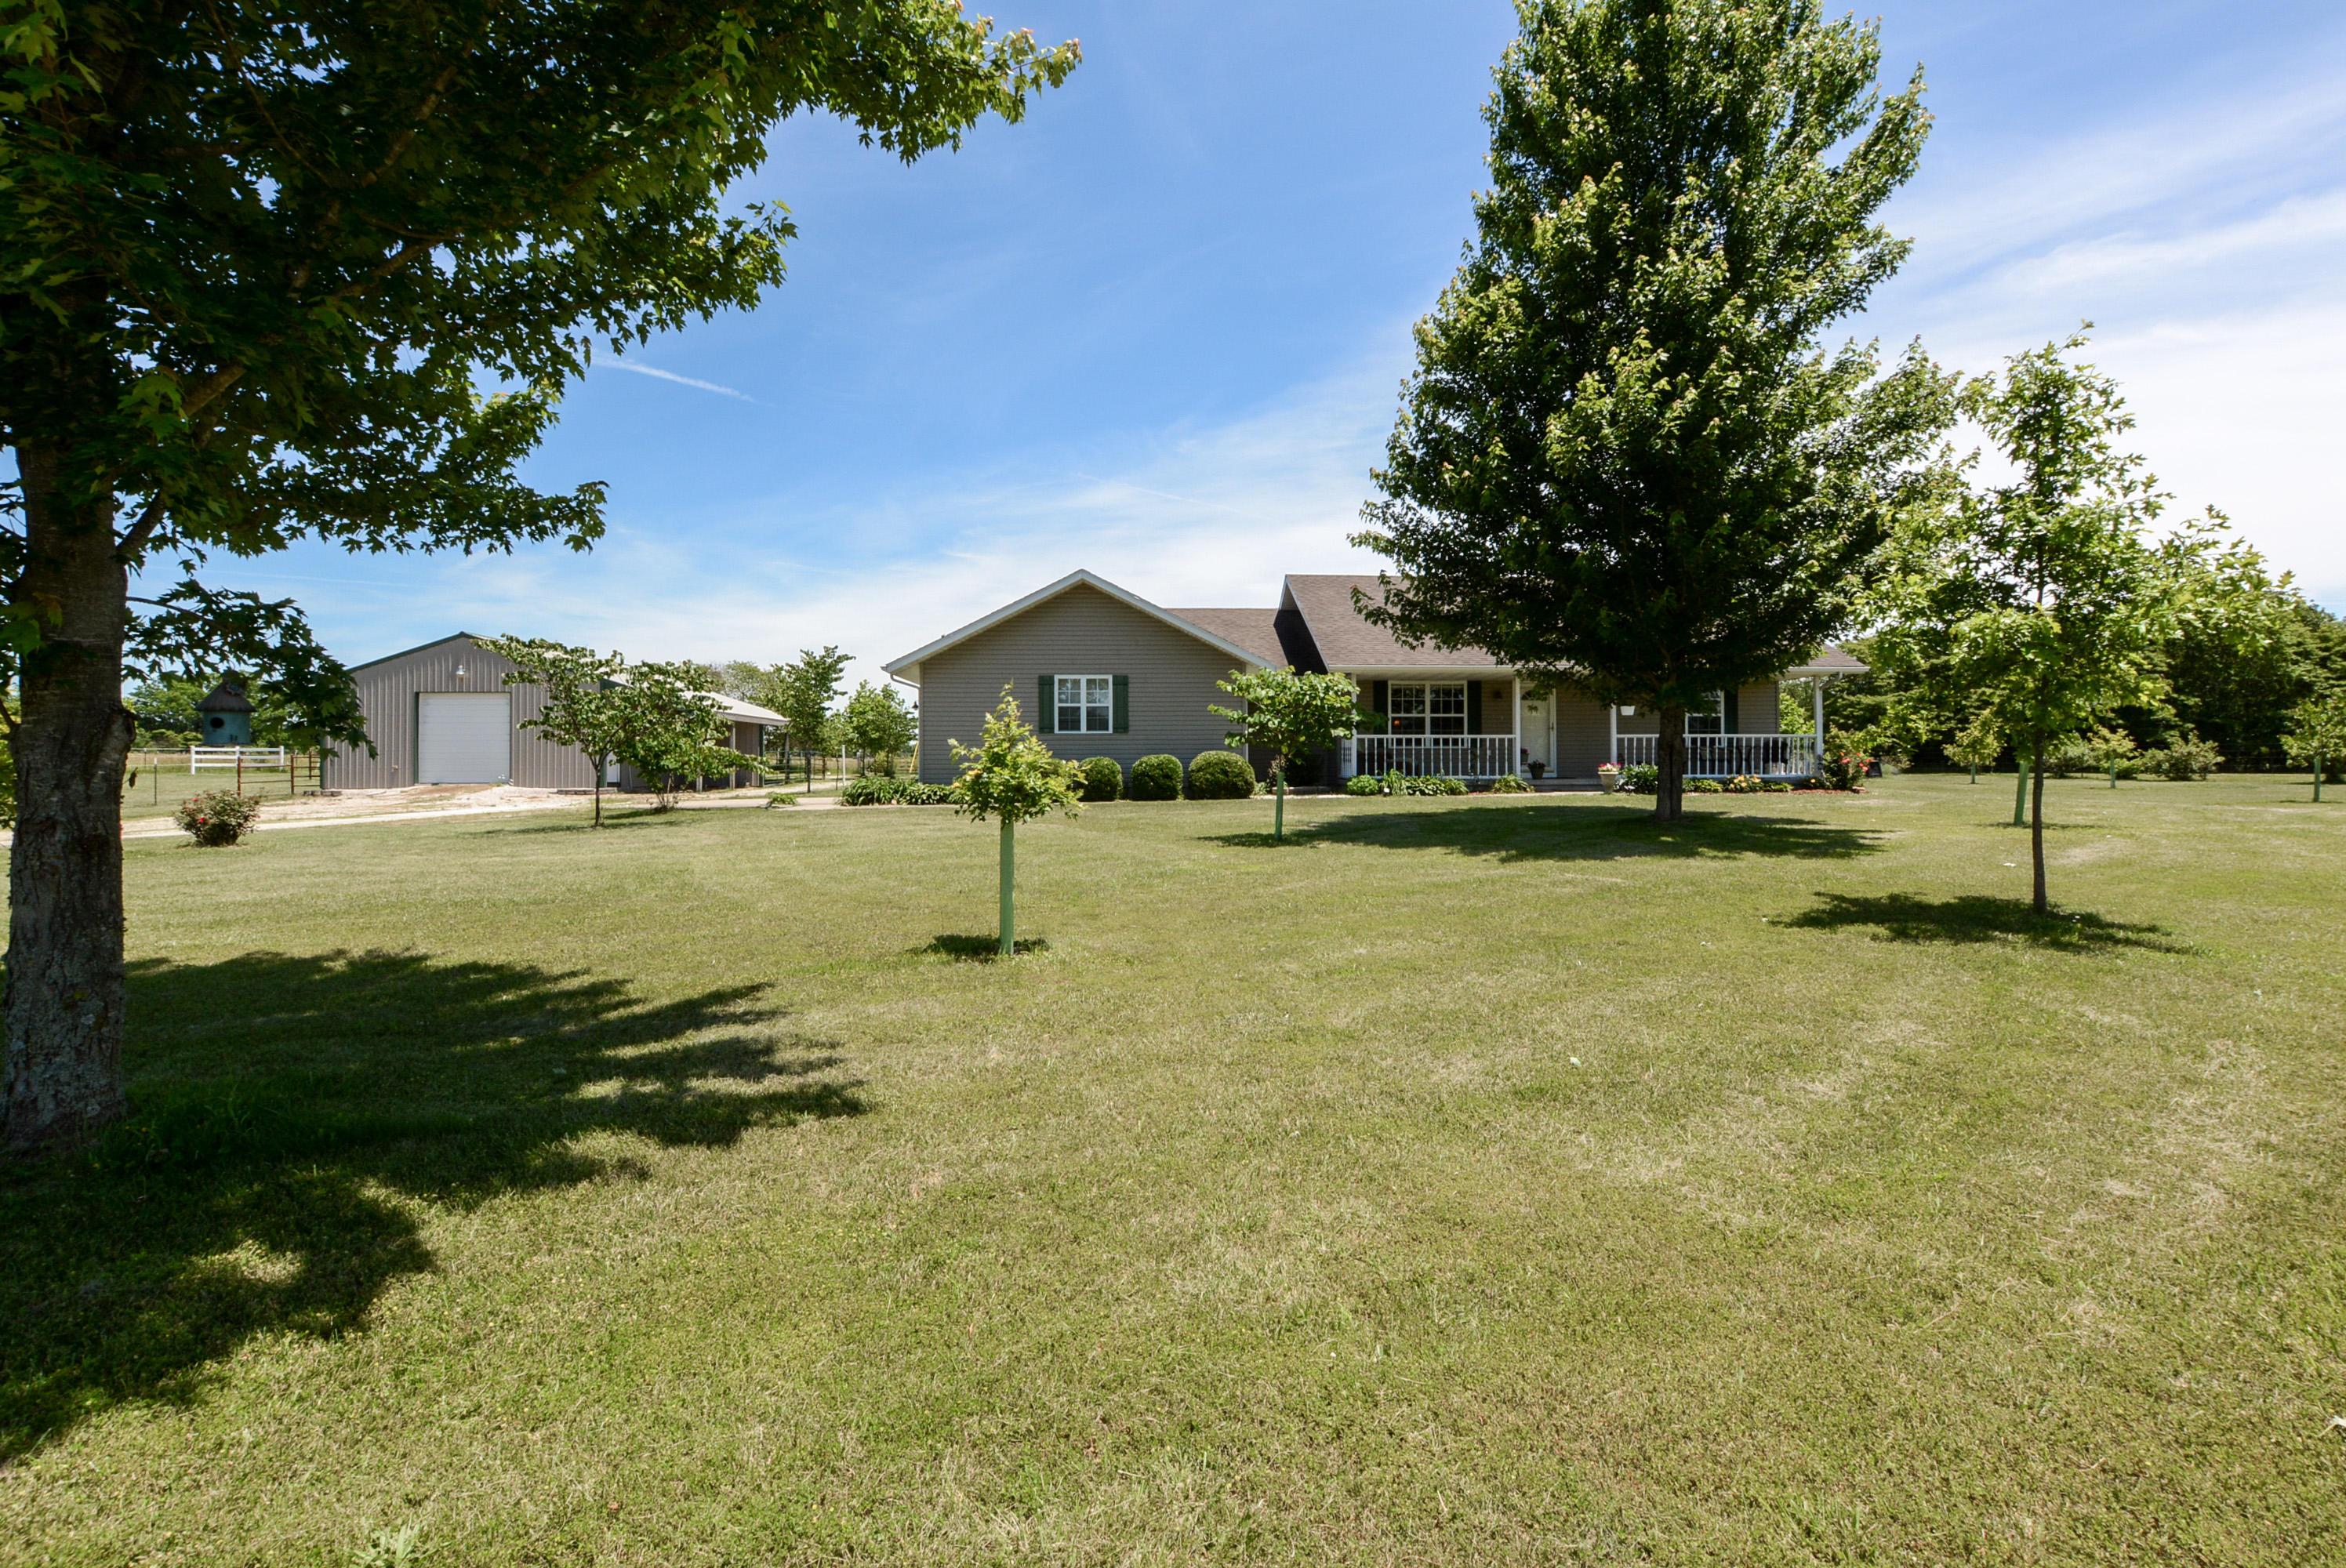 5860 State Hwy U Rogersville, MO 65742